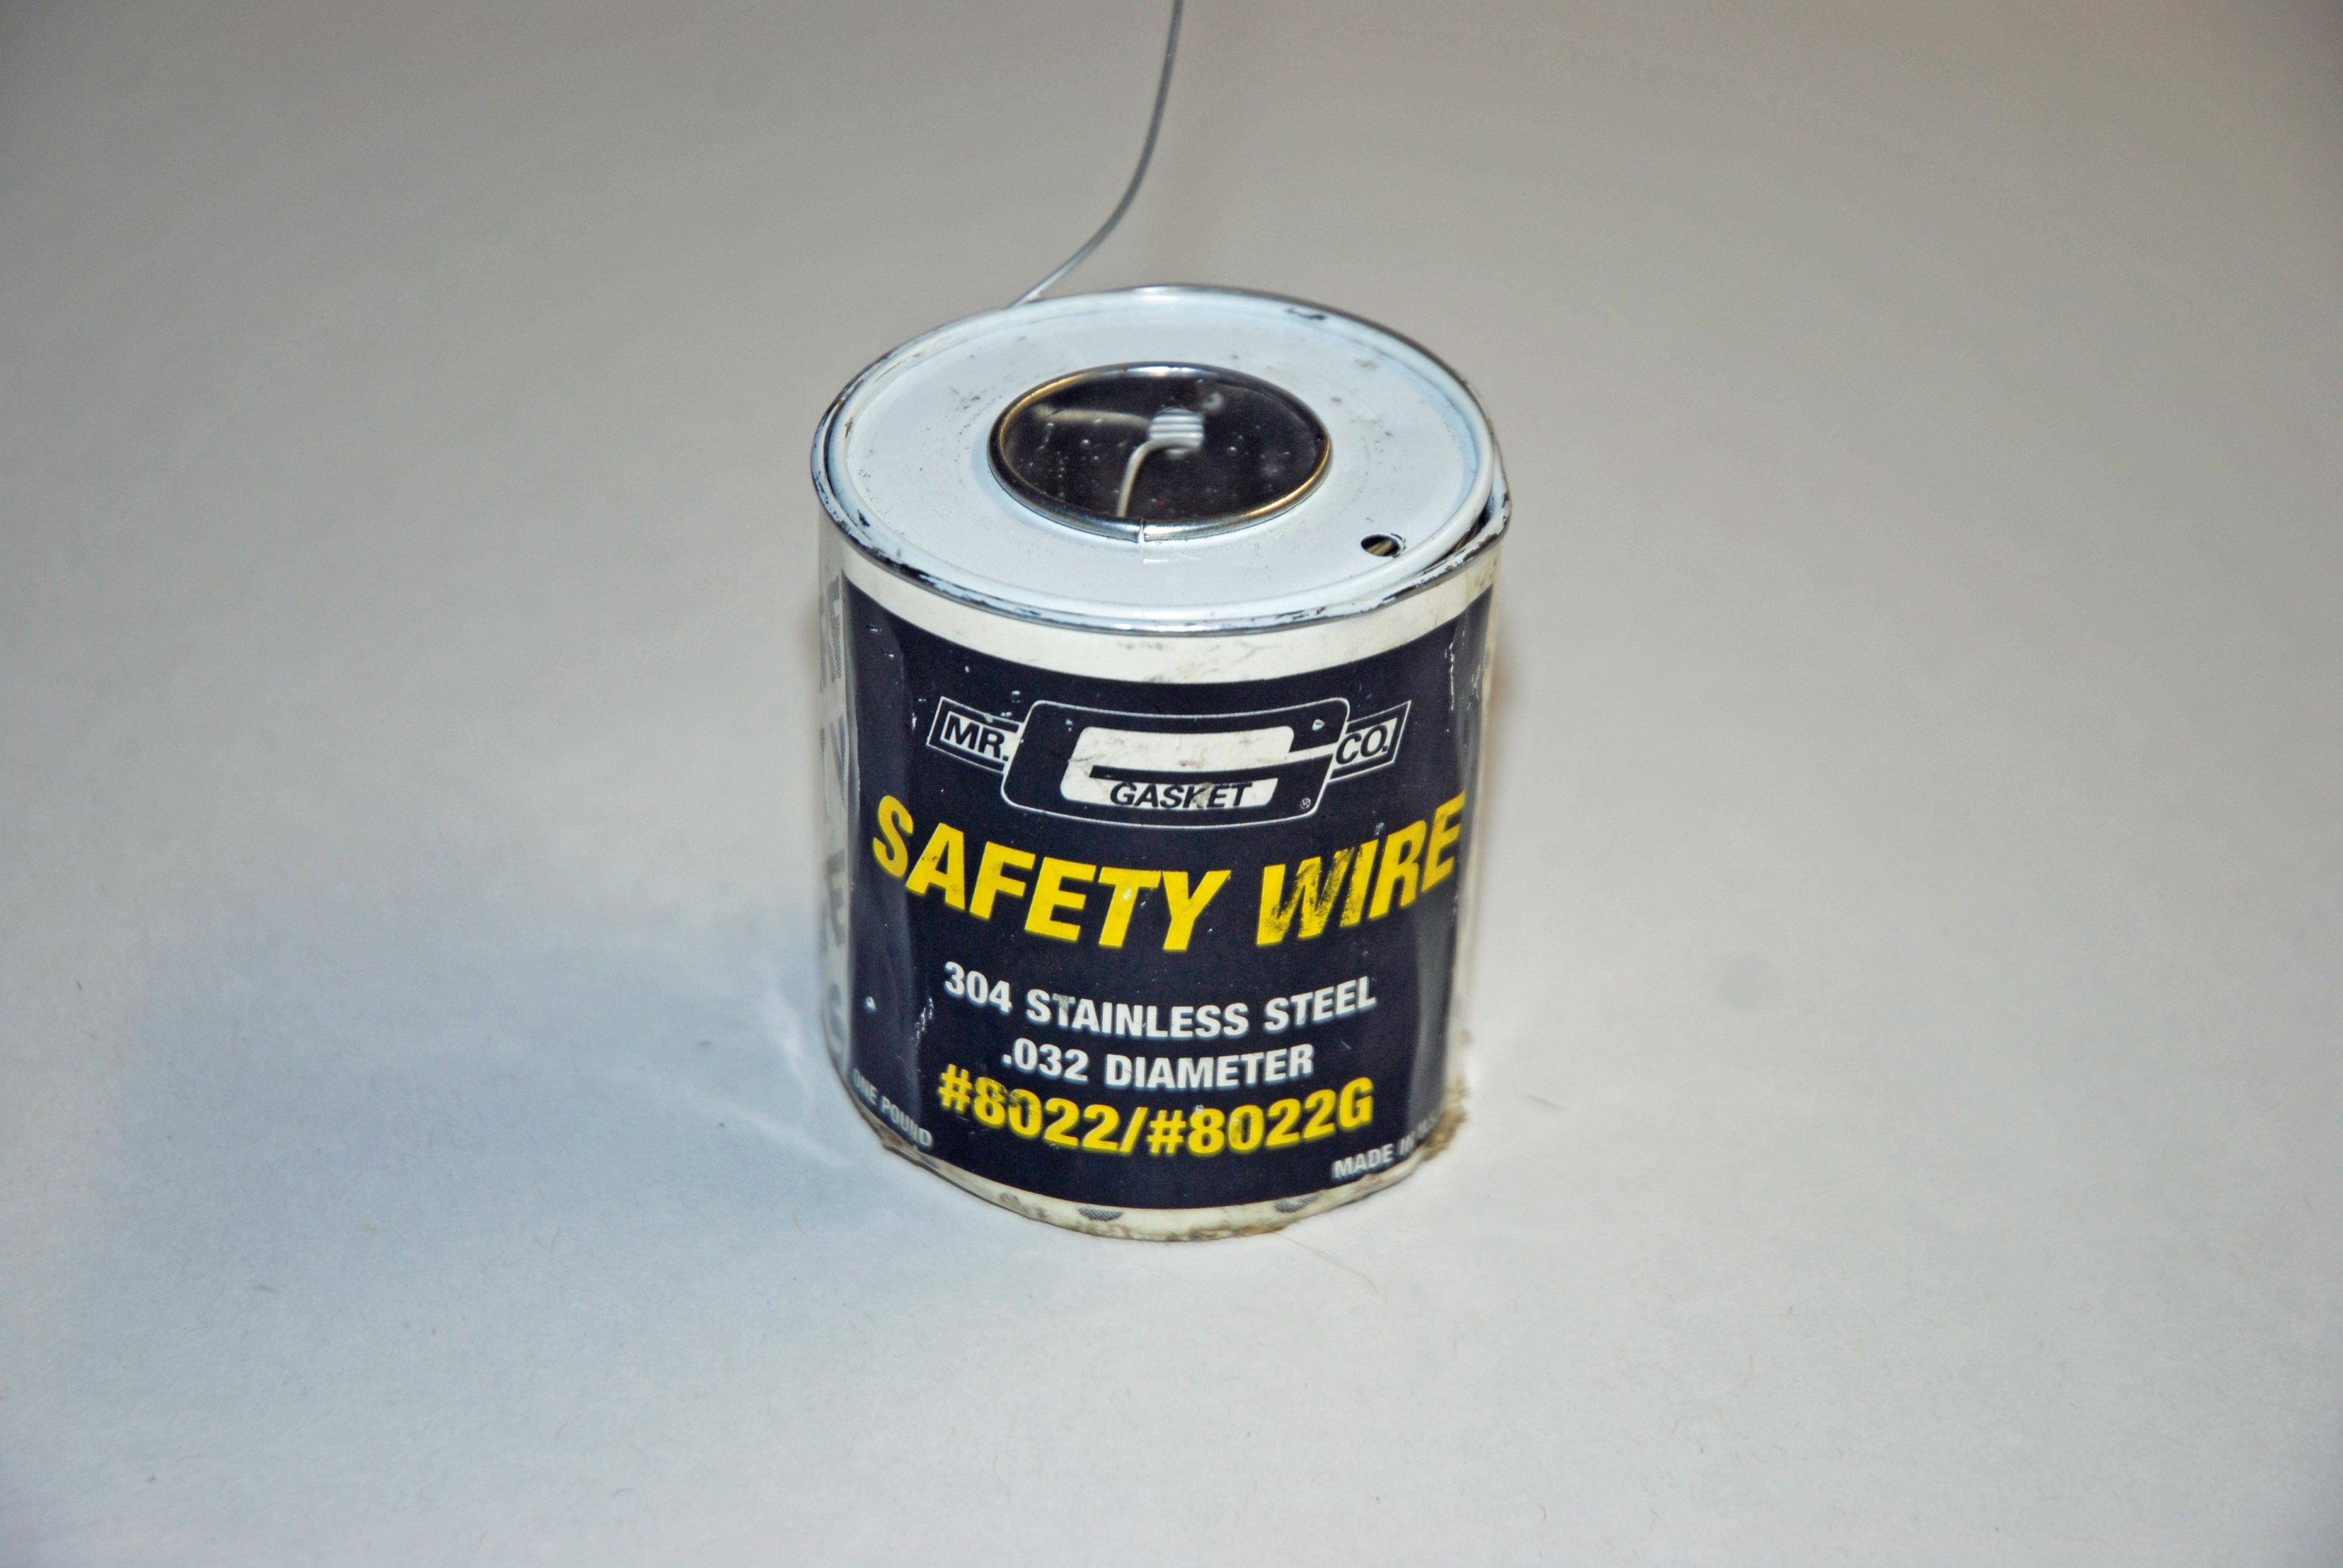 Safety First: Safety Wire